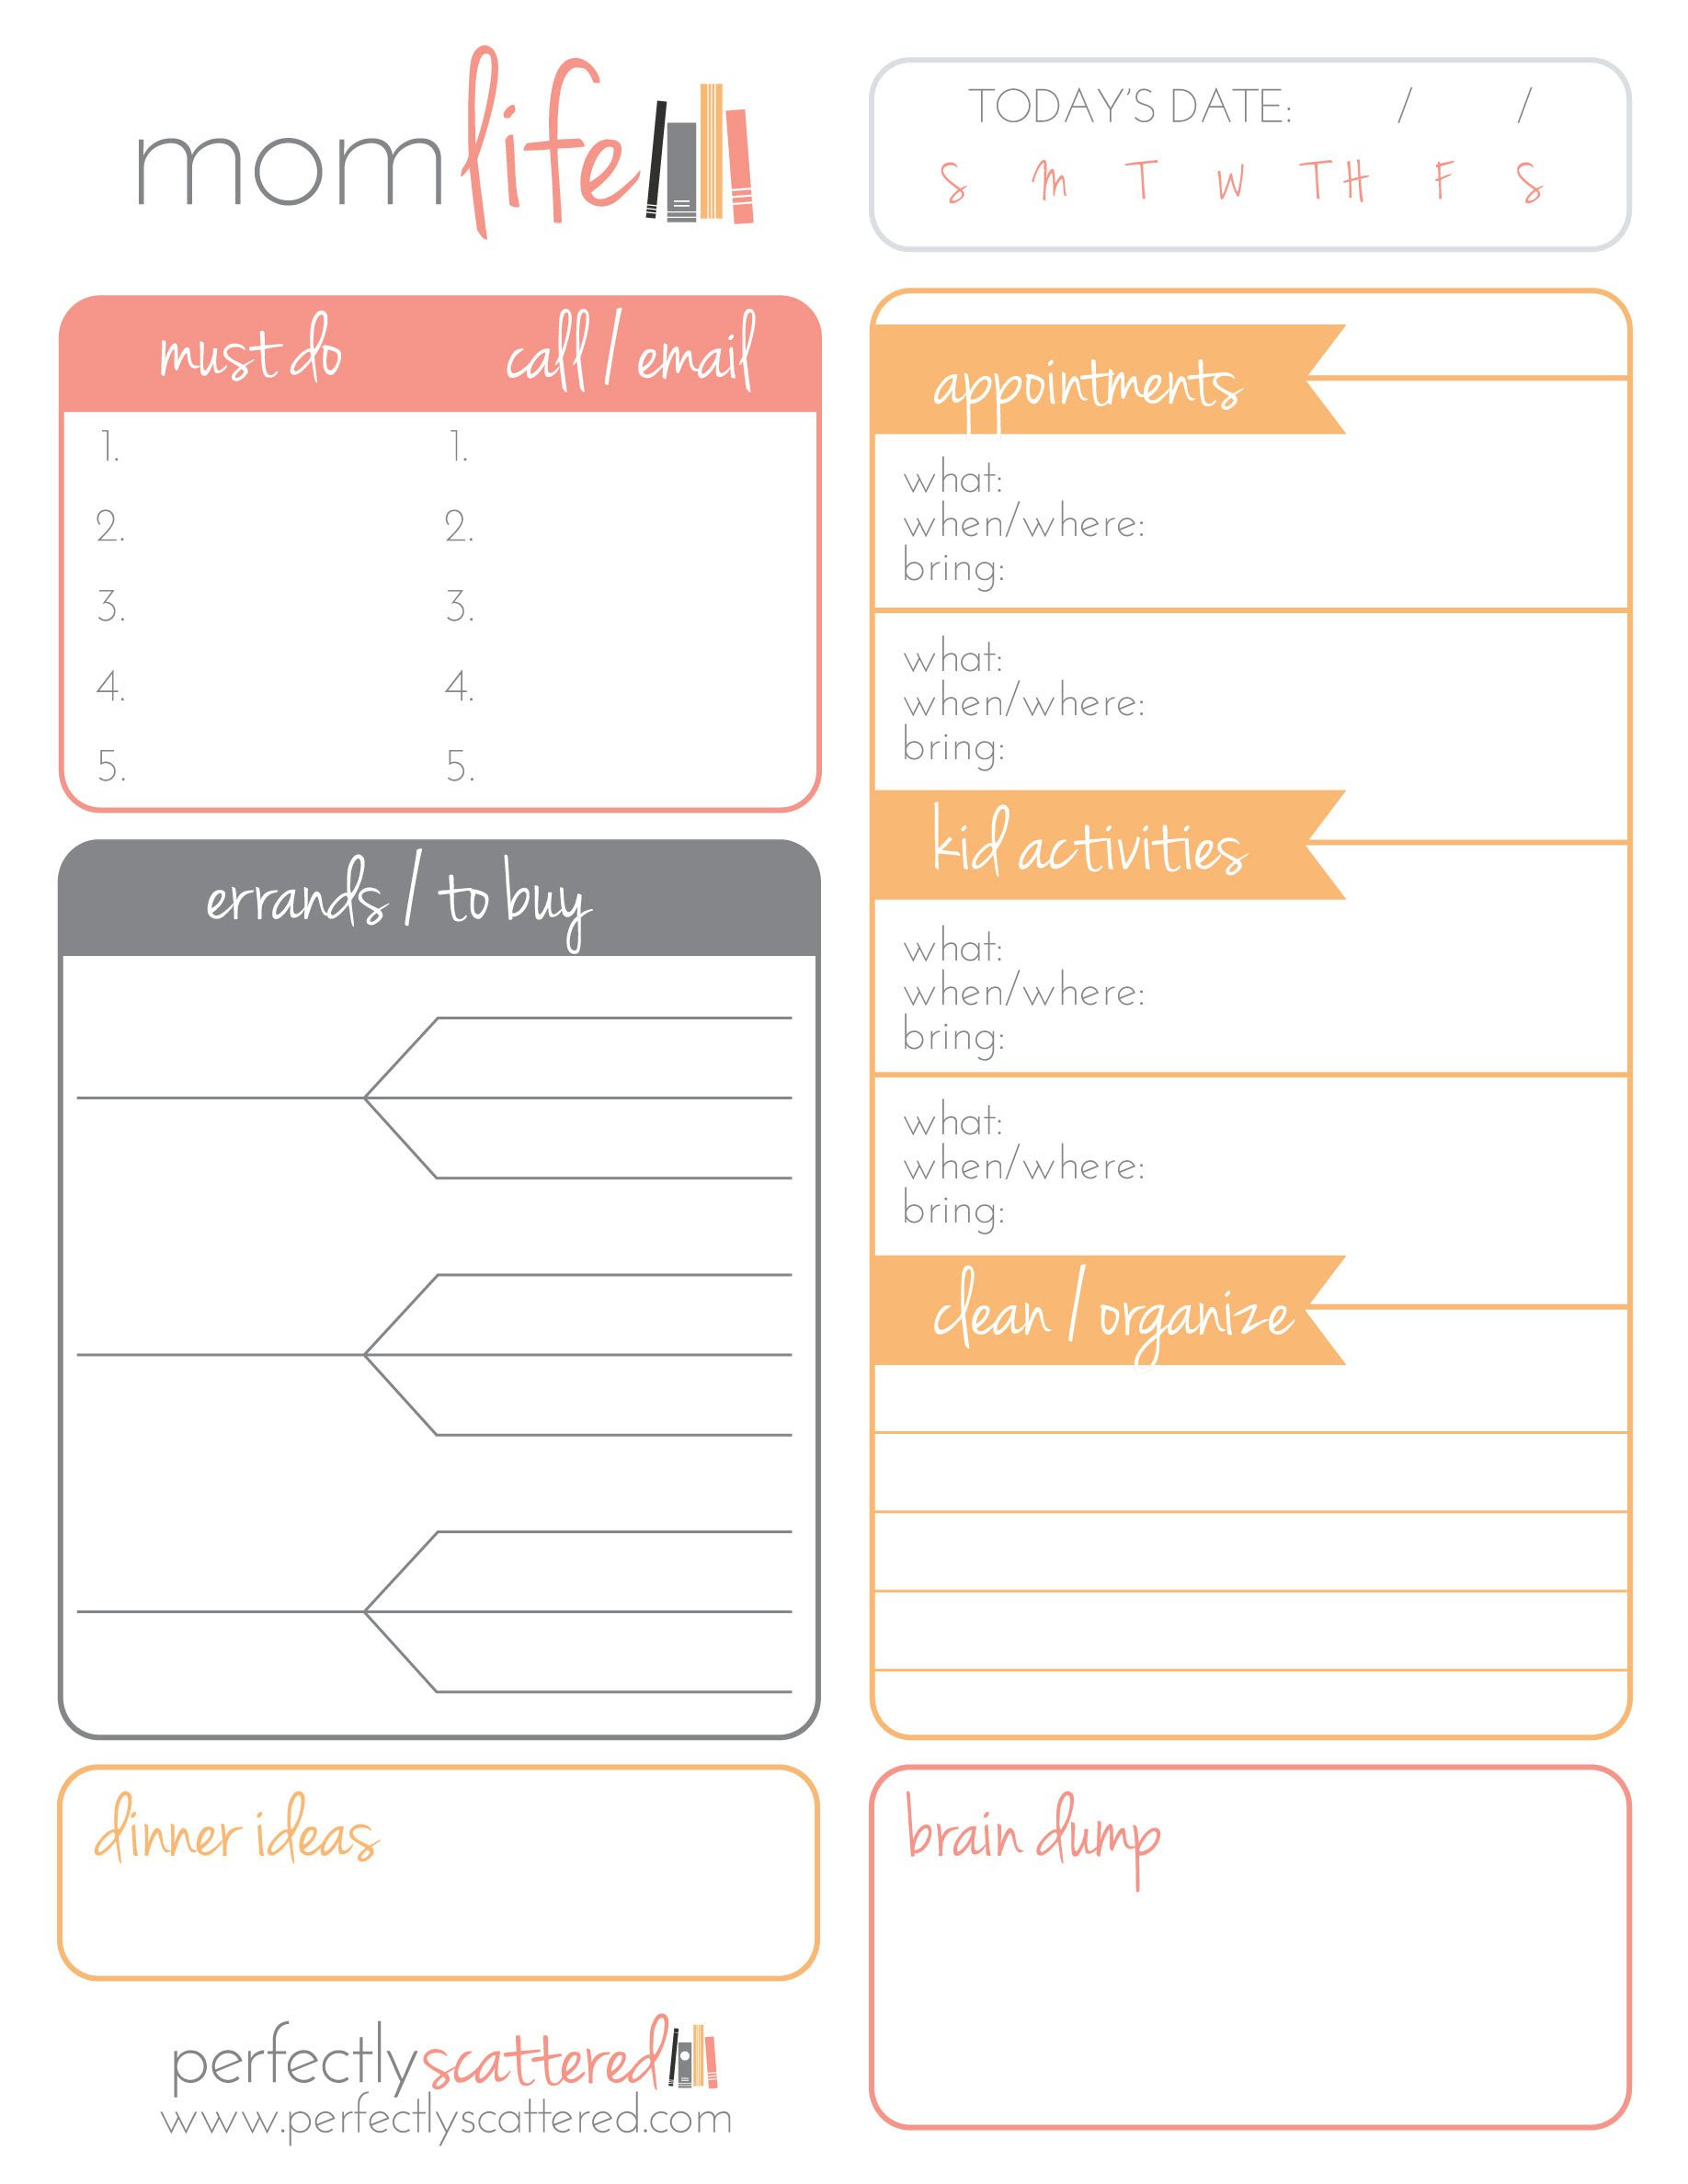 Free Printable Daily Planner for Moms - Money Saving Mom®